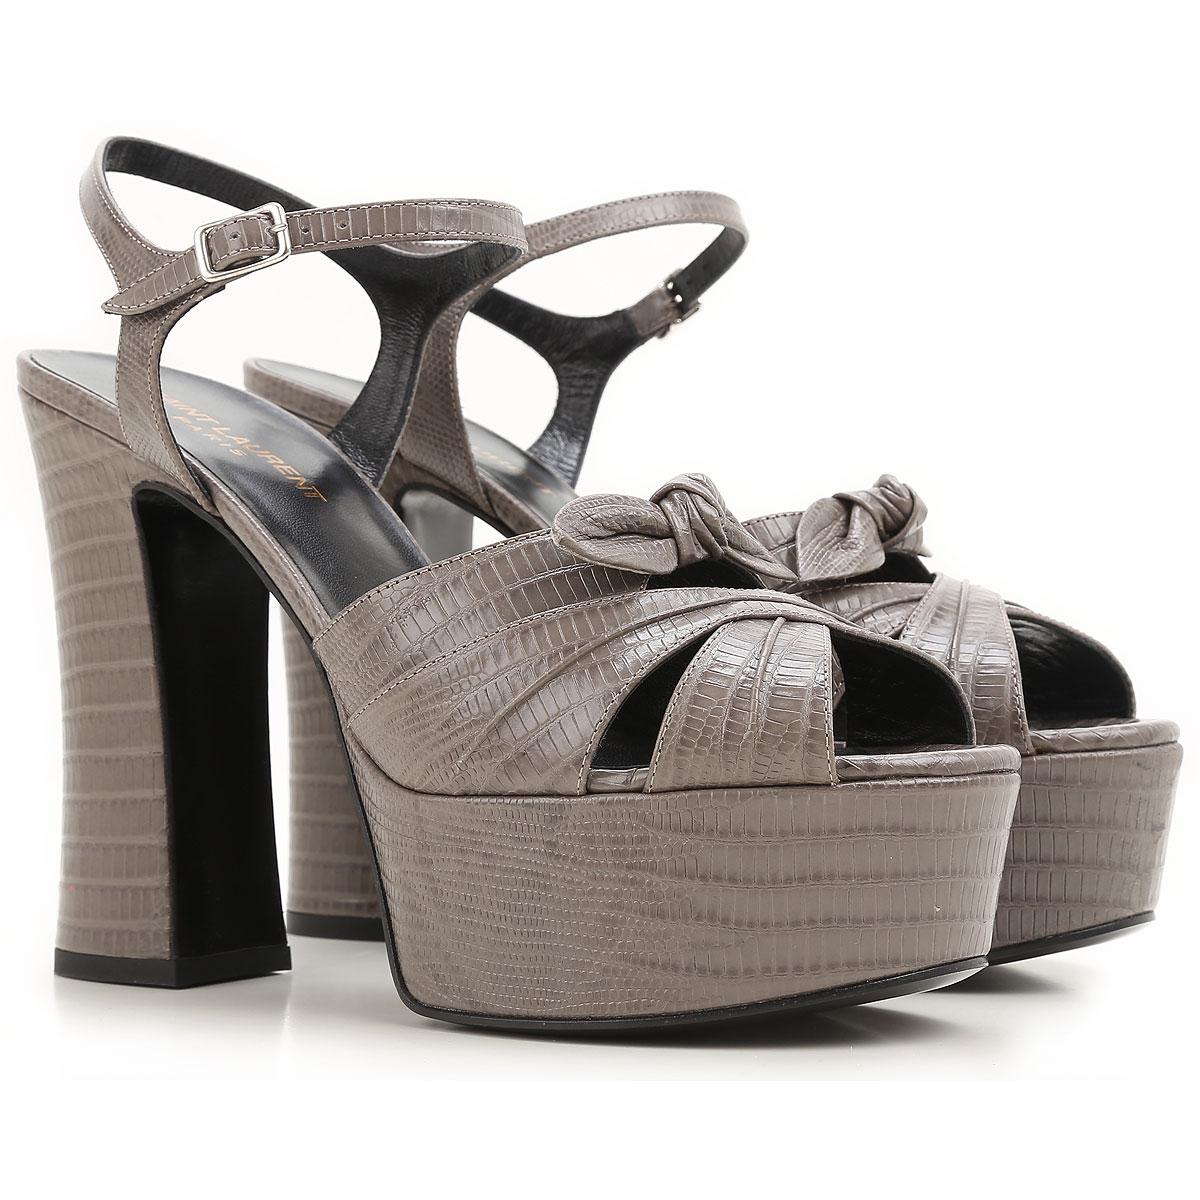 chaussures femme yves saint laurent code produit 384977 cj500 1202. Black Bedroom Furniture Sets. Home Design Ideas